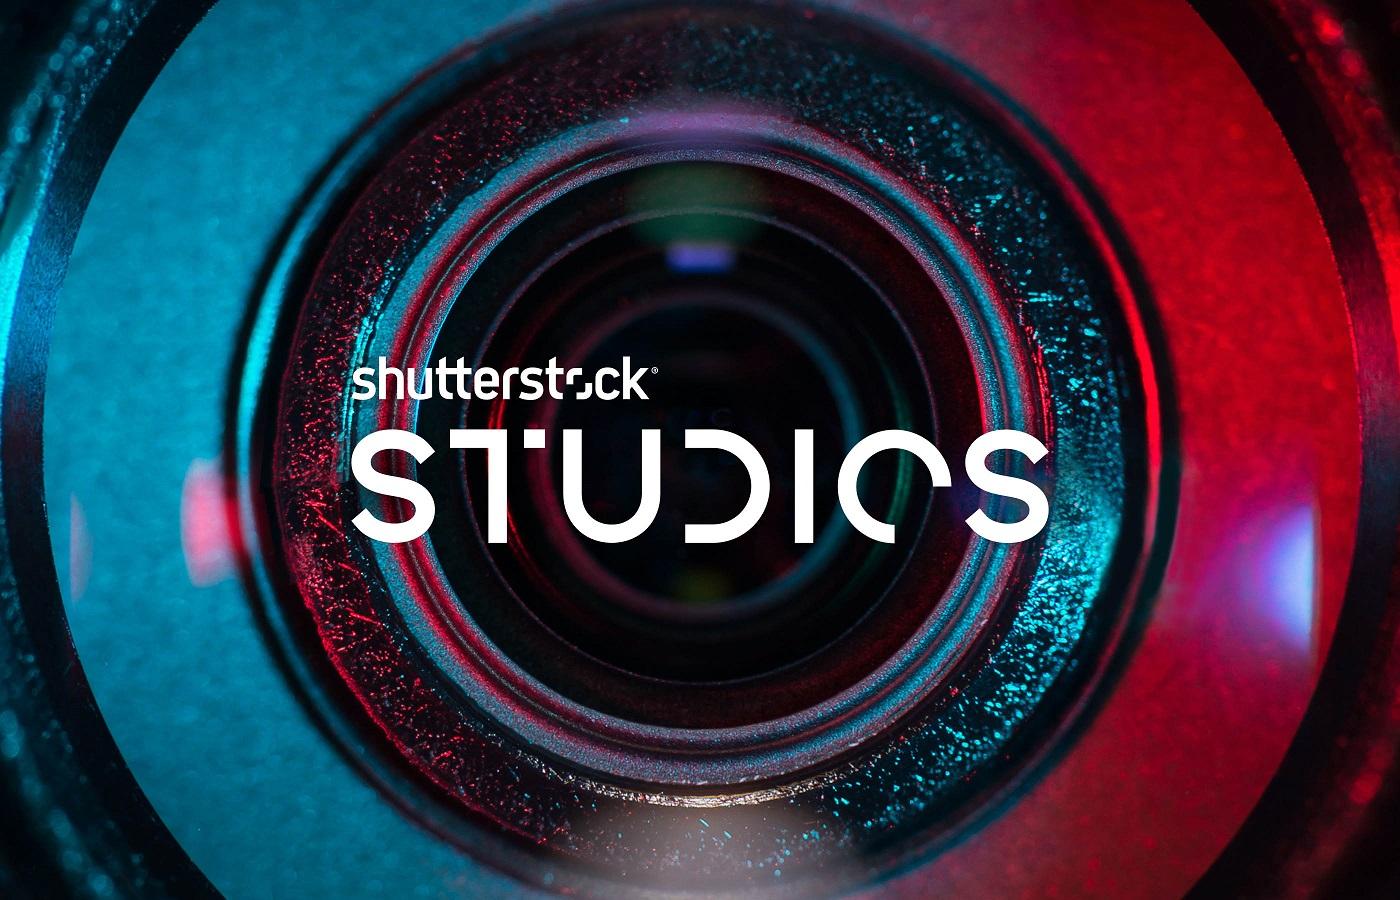 Shutterstock Studios Cover